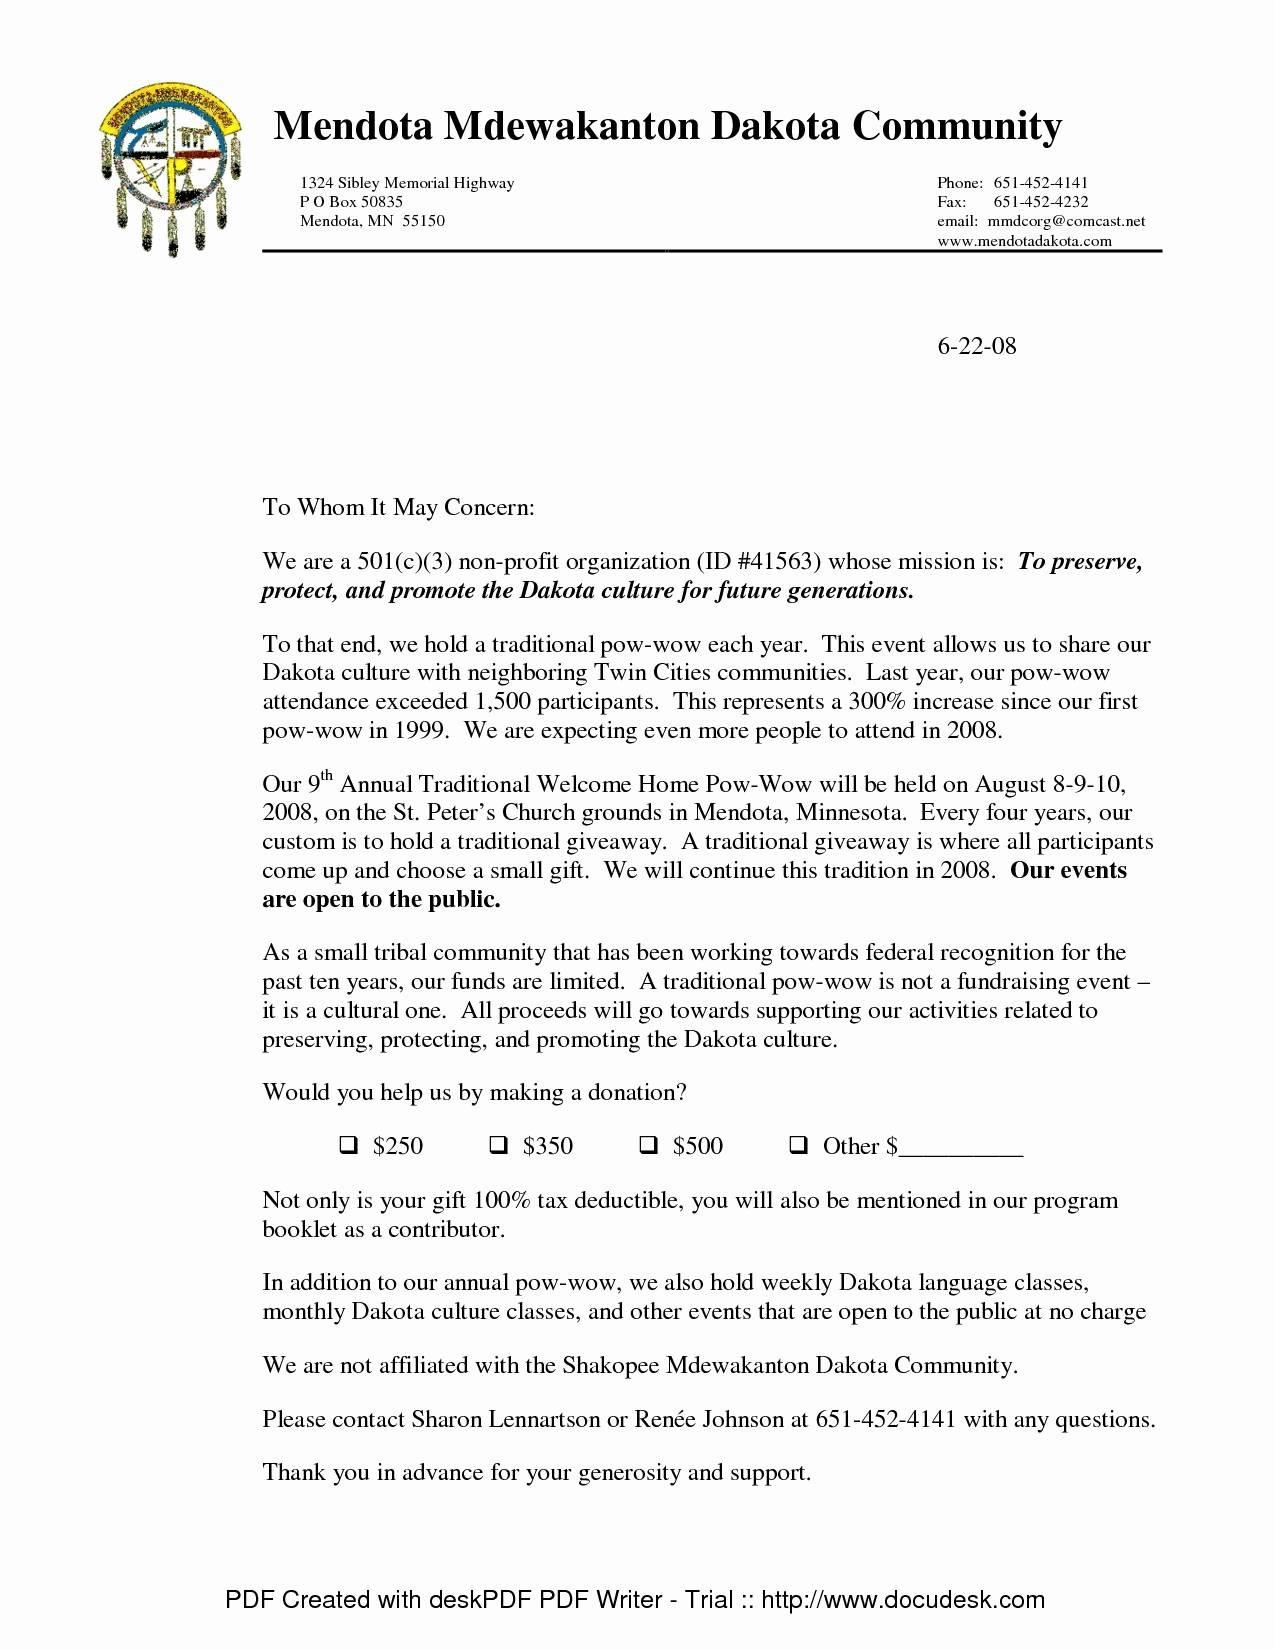 sample donation receipt letter for non profit